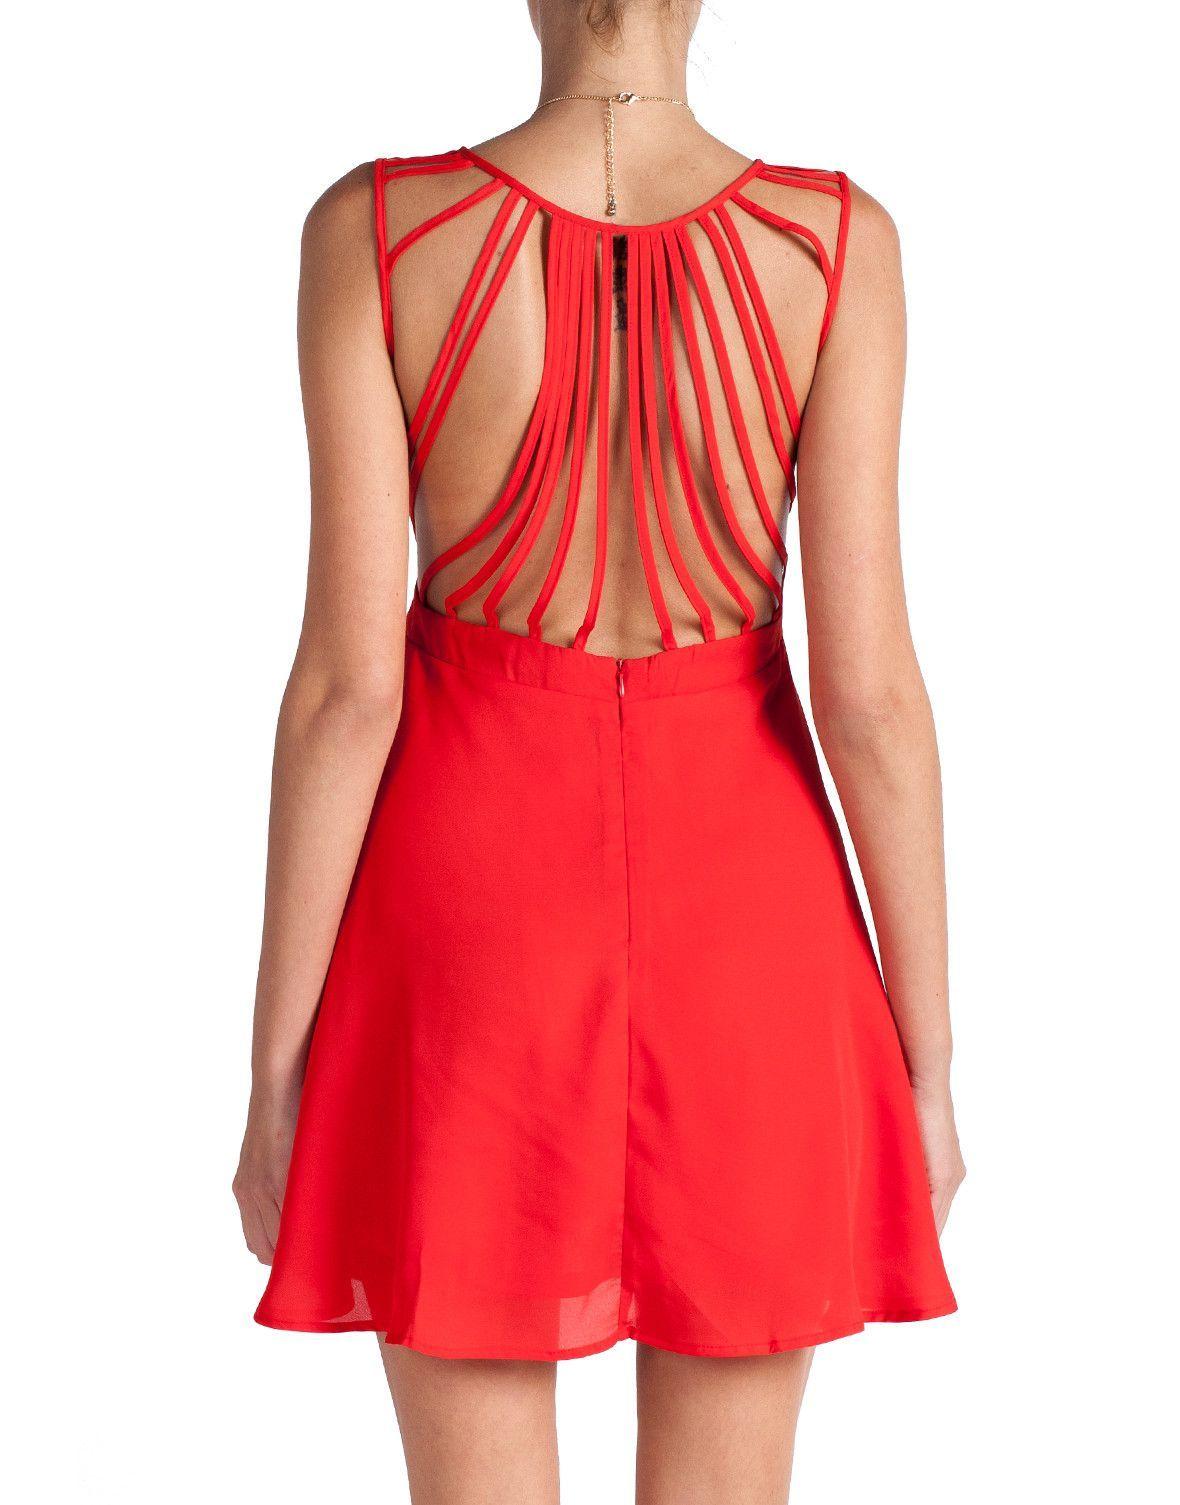 Strapped dress red open back nyedress dresses under